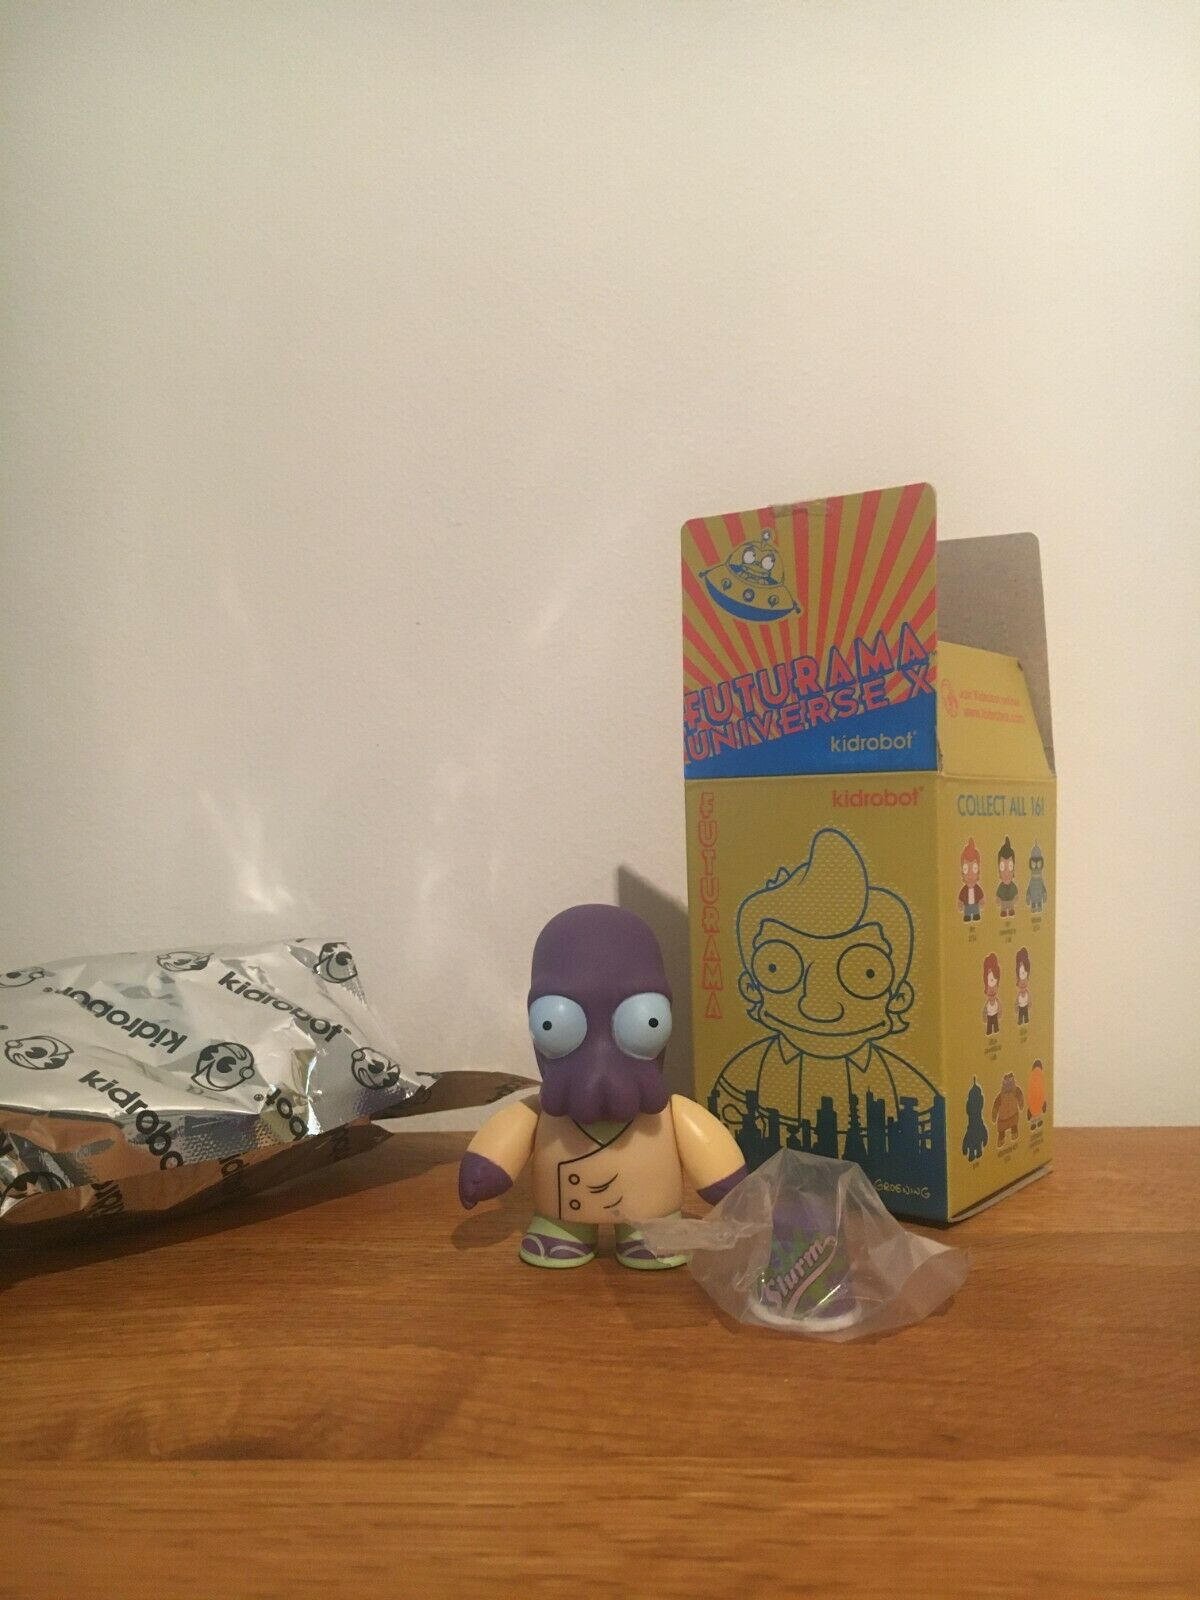 Blau Zoidberg Universe B - Rare Chase 1 96 Kidrobot X Futurama Vinyl Figure NEW